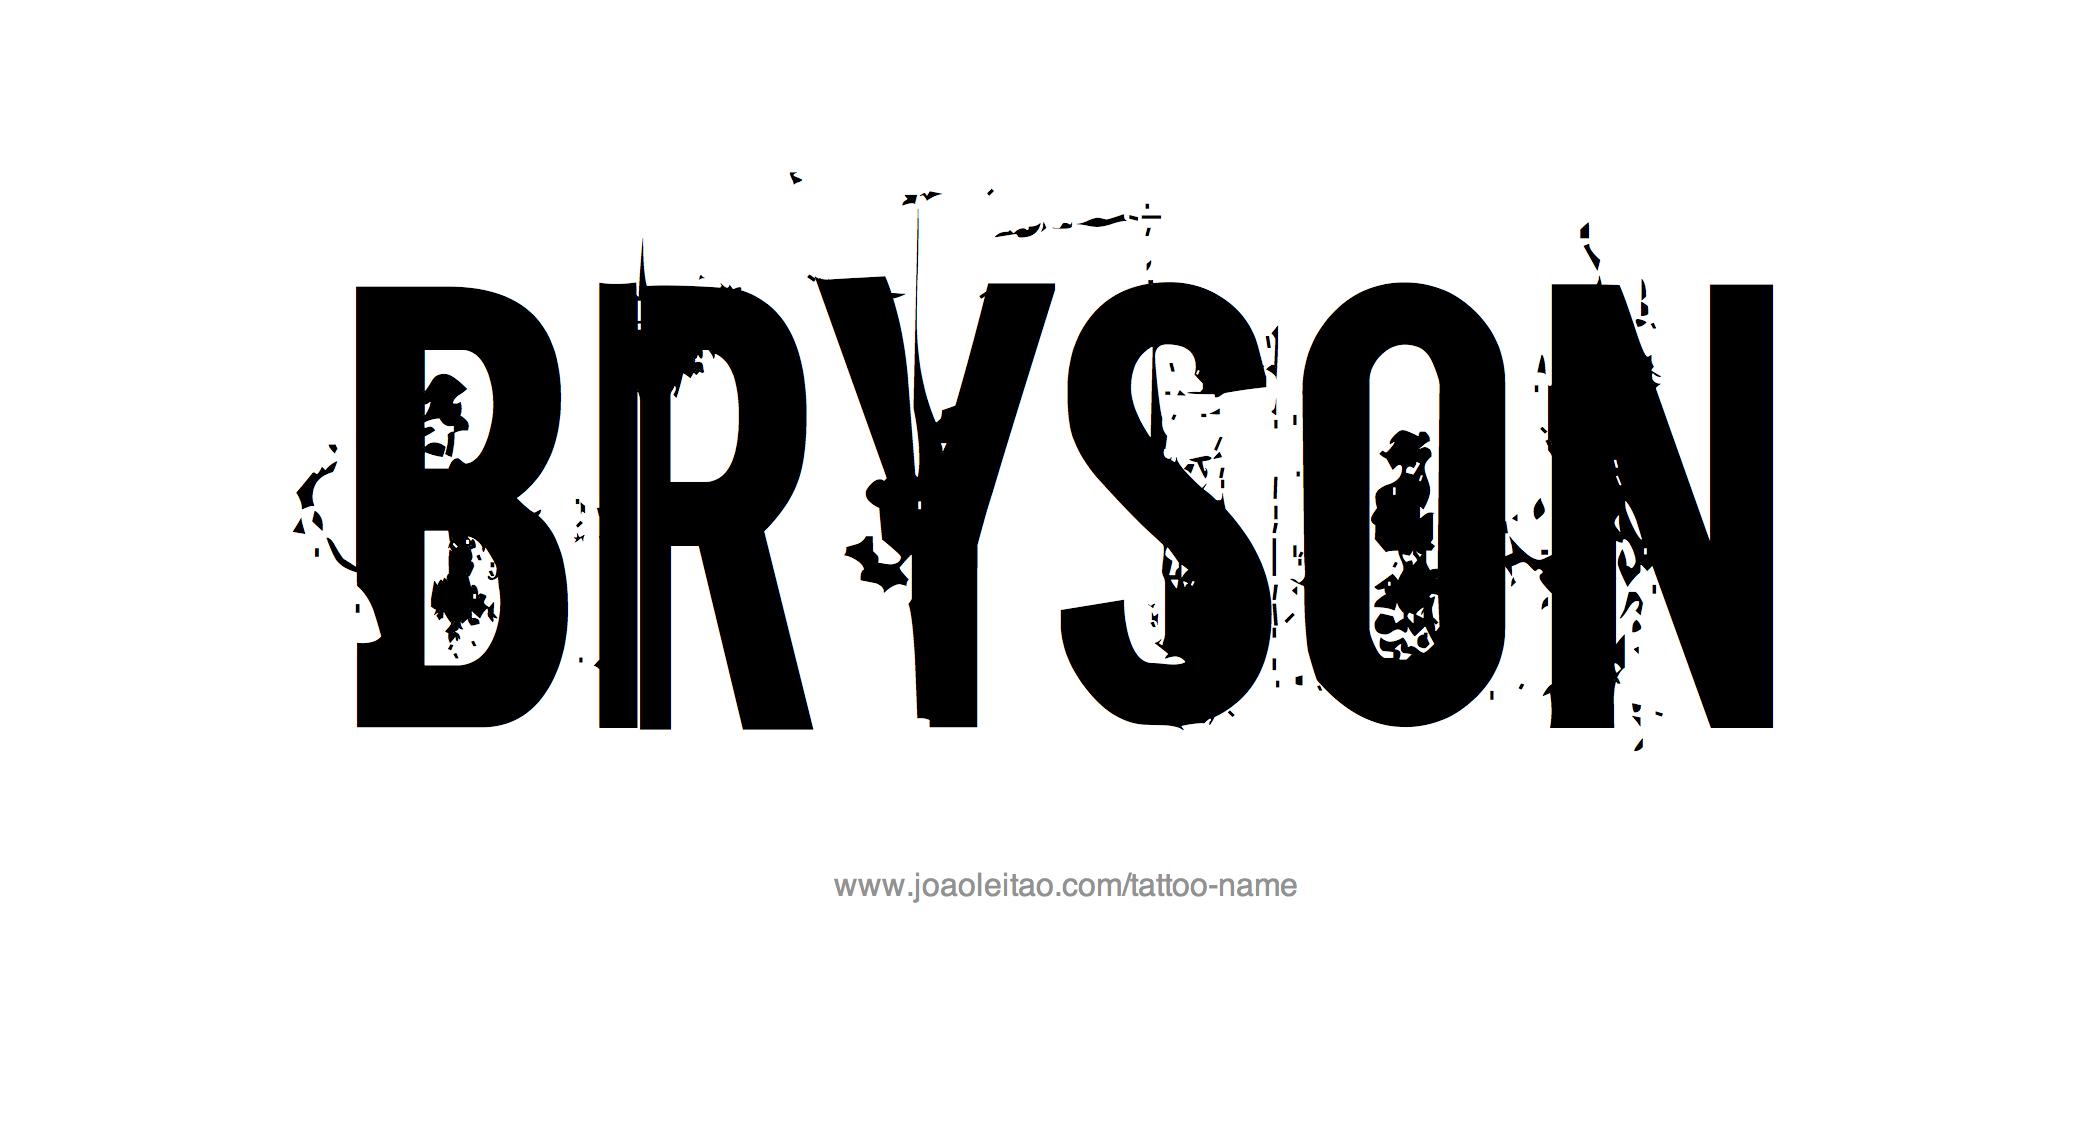 Name: Bryson Name Tattoo Designs